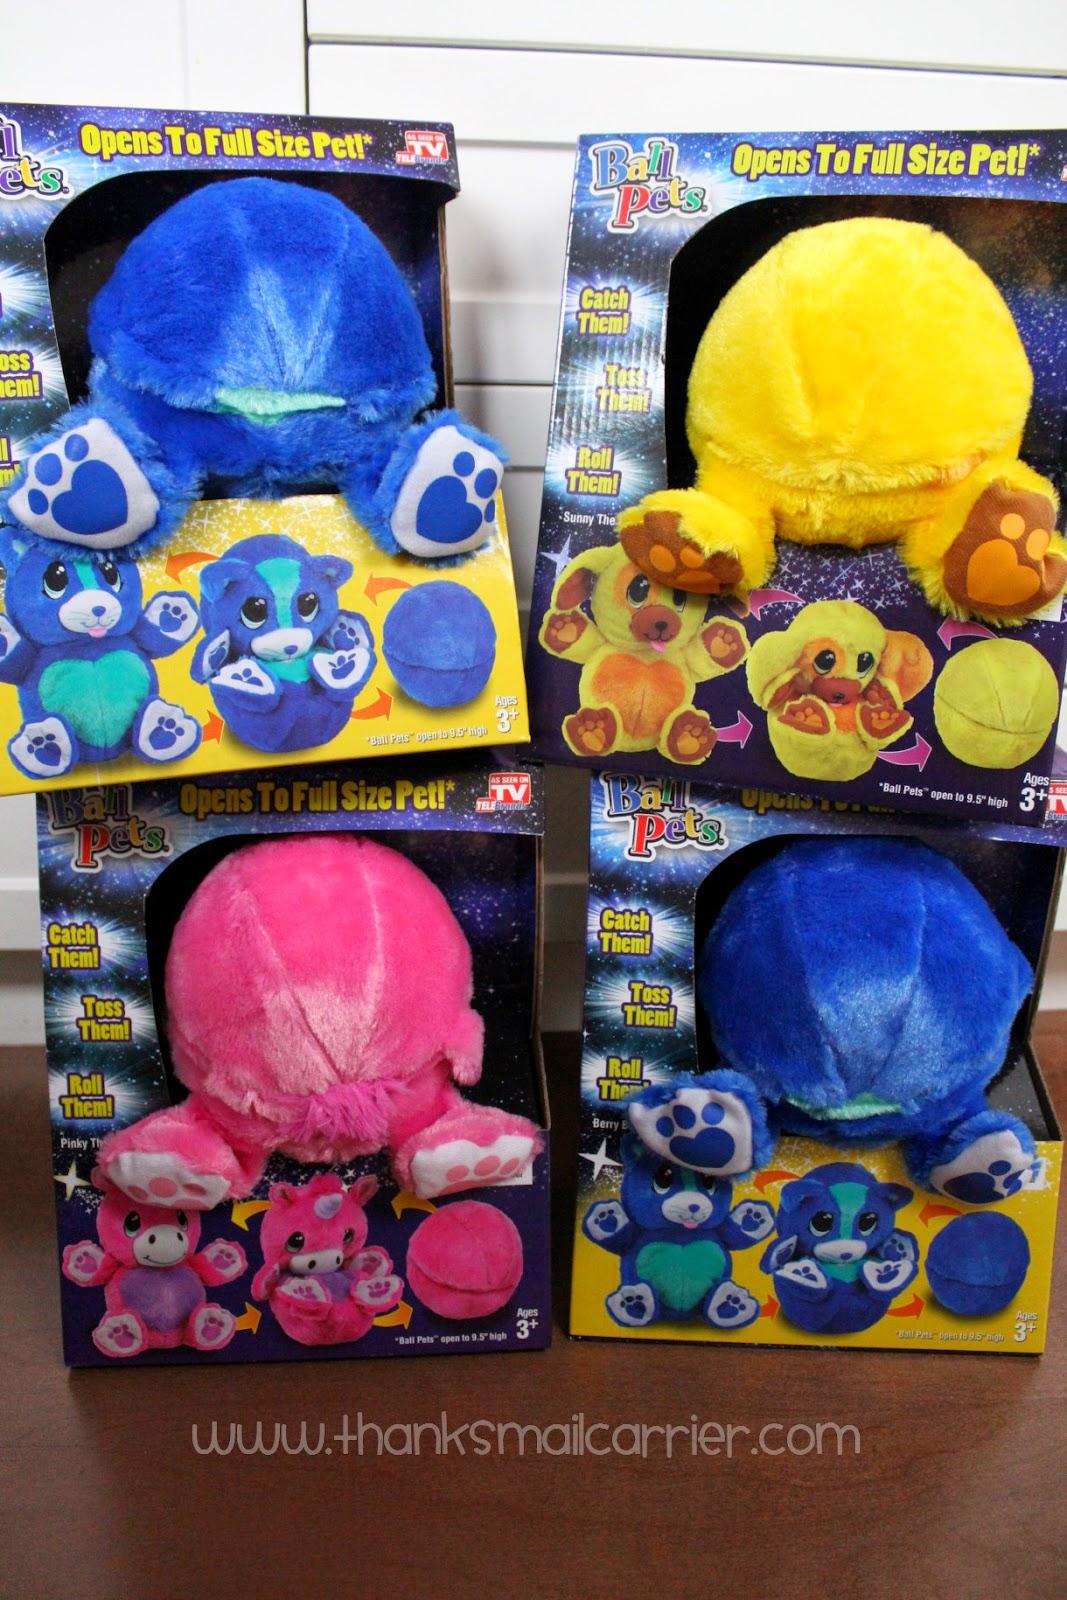 Ball Pets toys